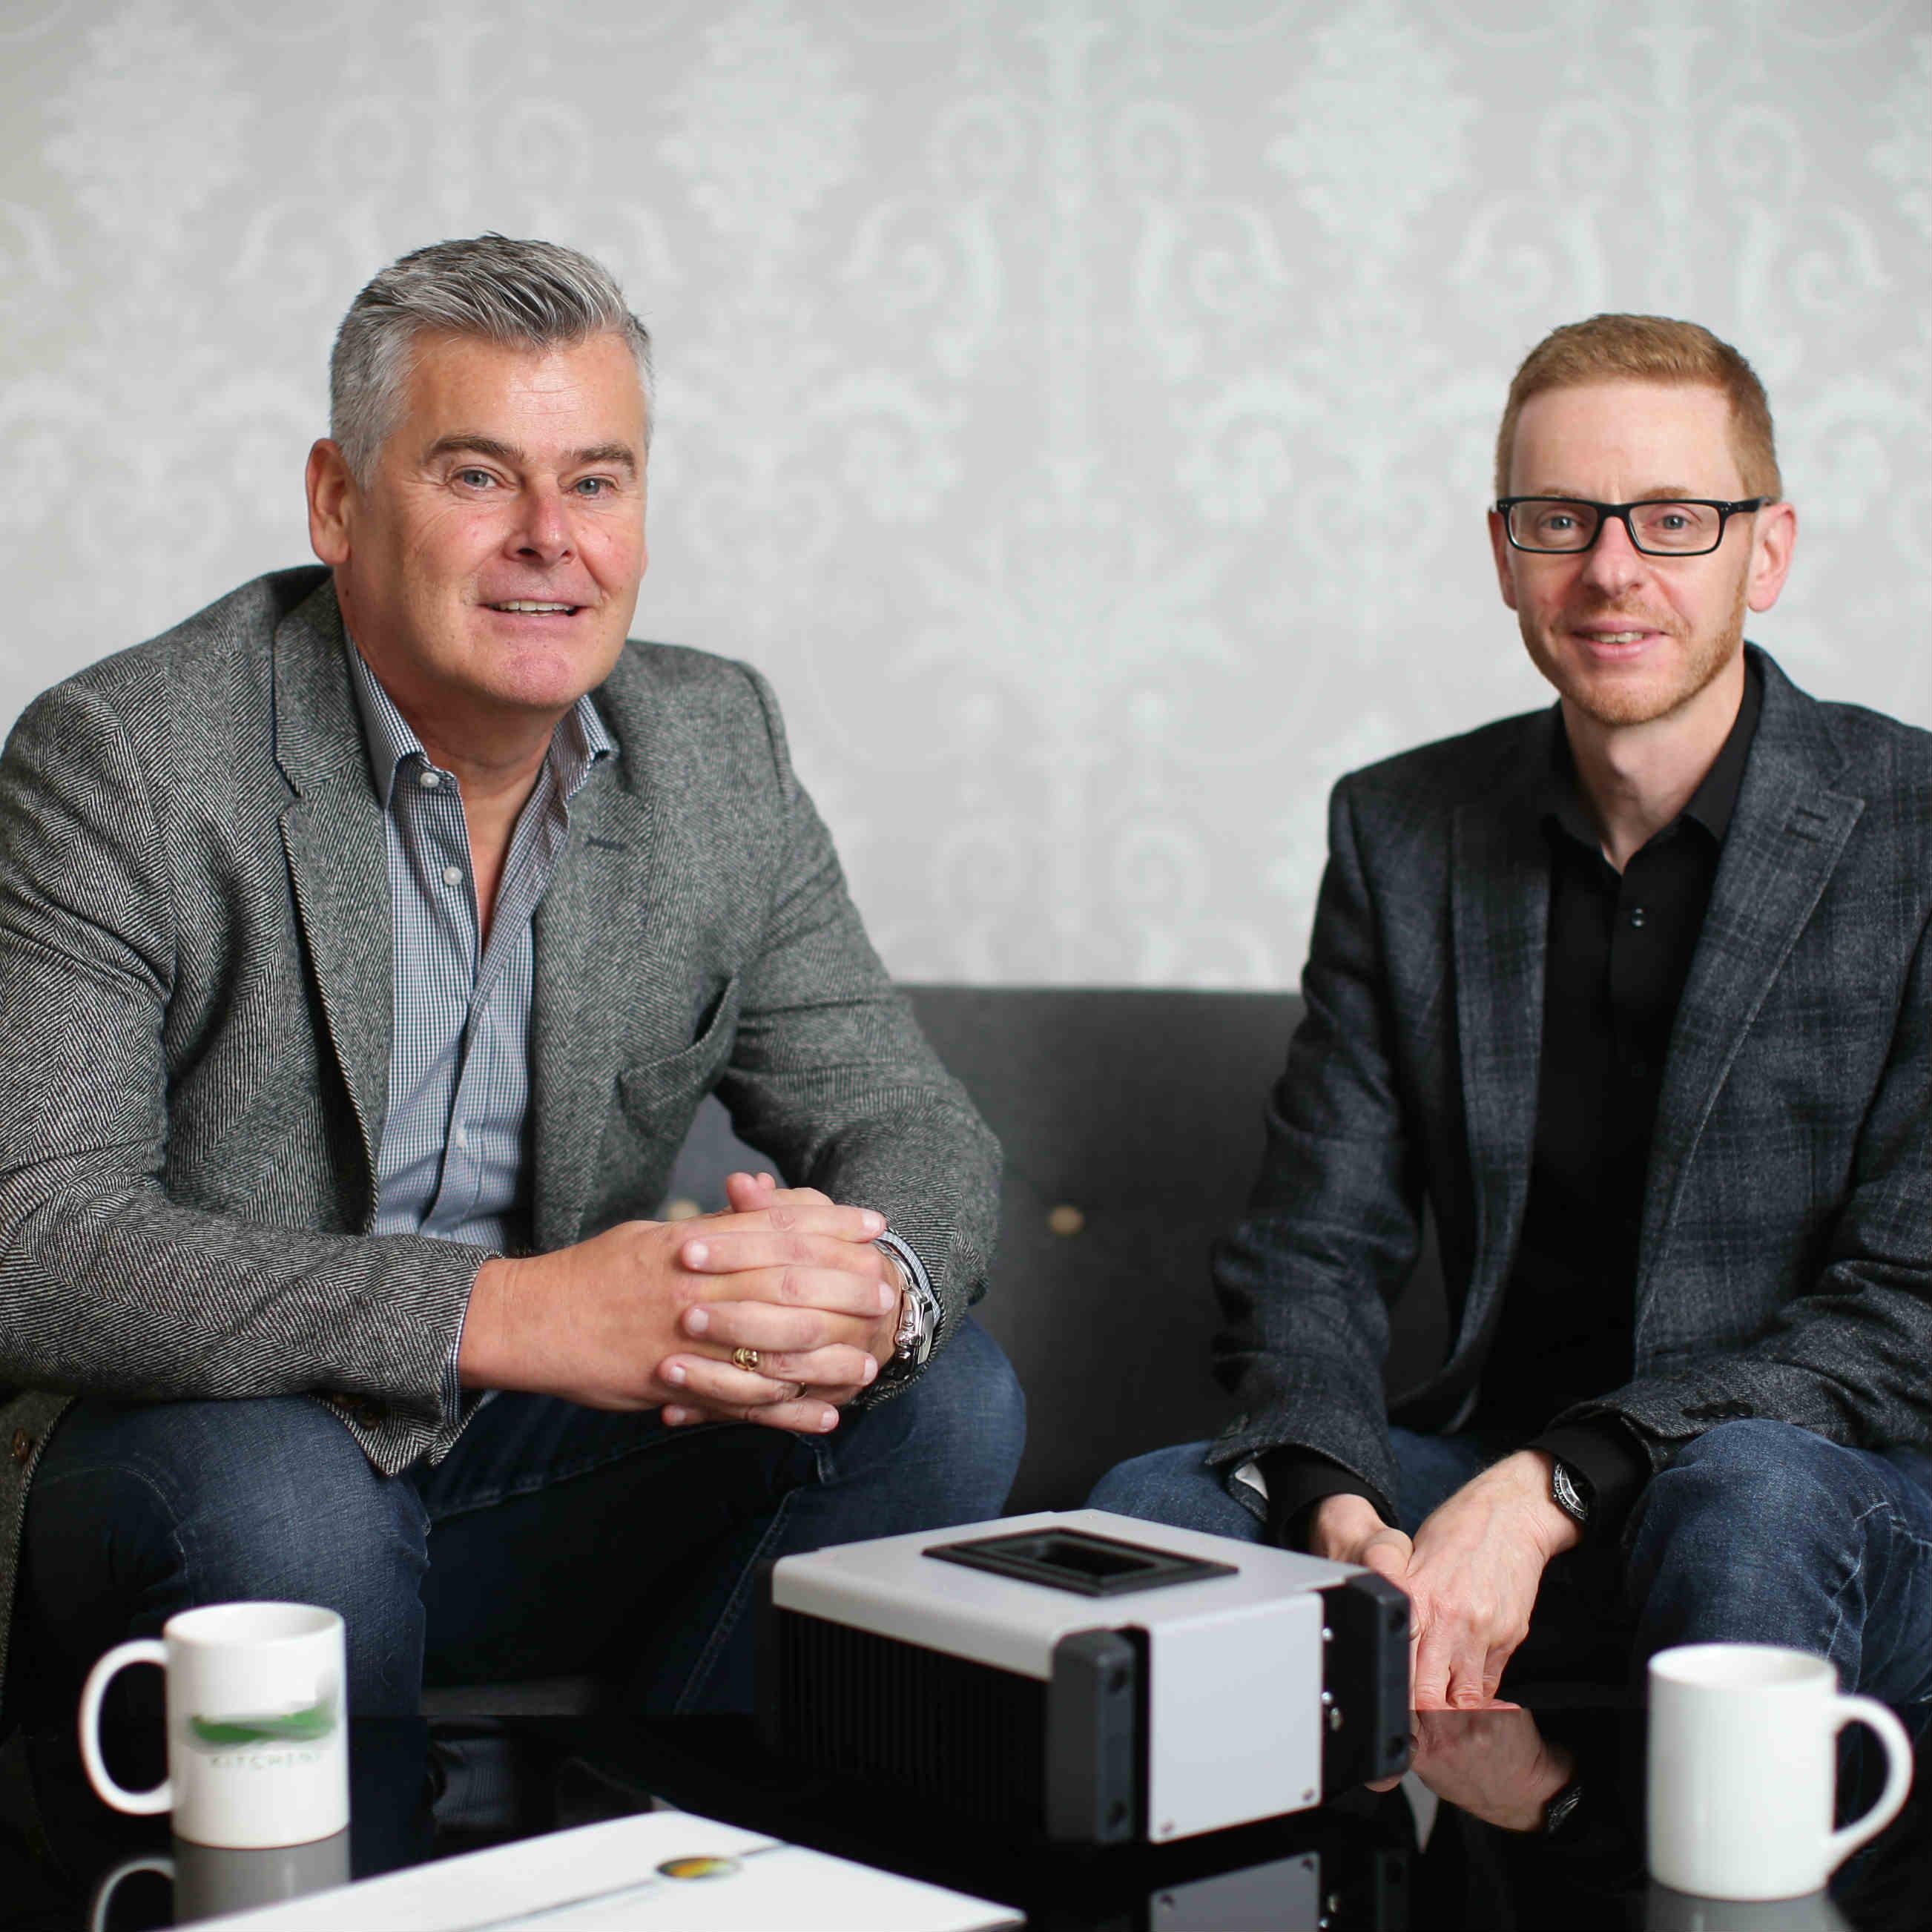 High speed ballast designer and manufacturer Power Gems Patrick McGuane and Phil Ellams